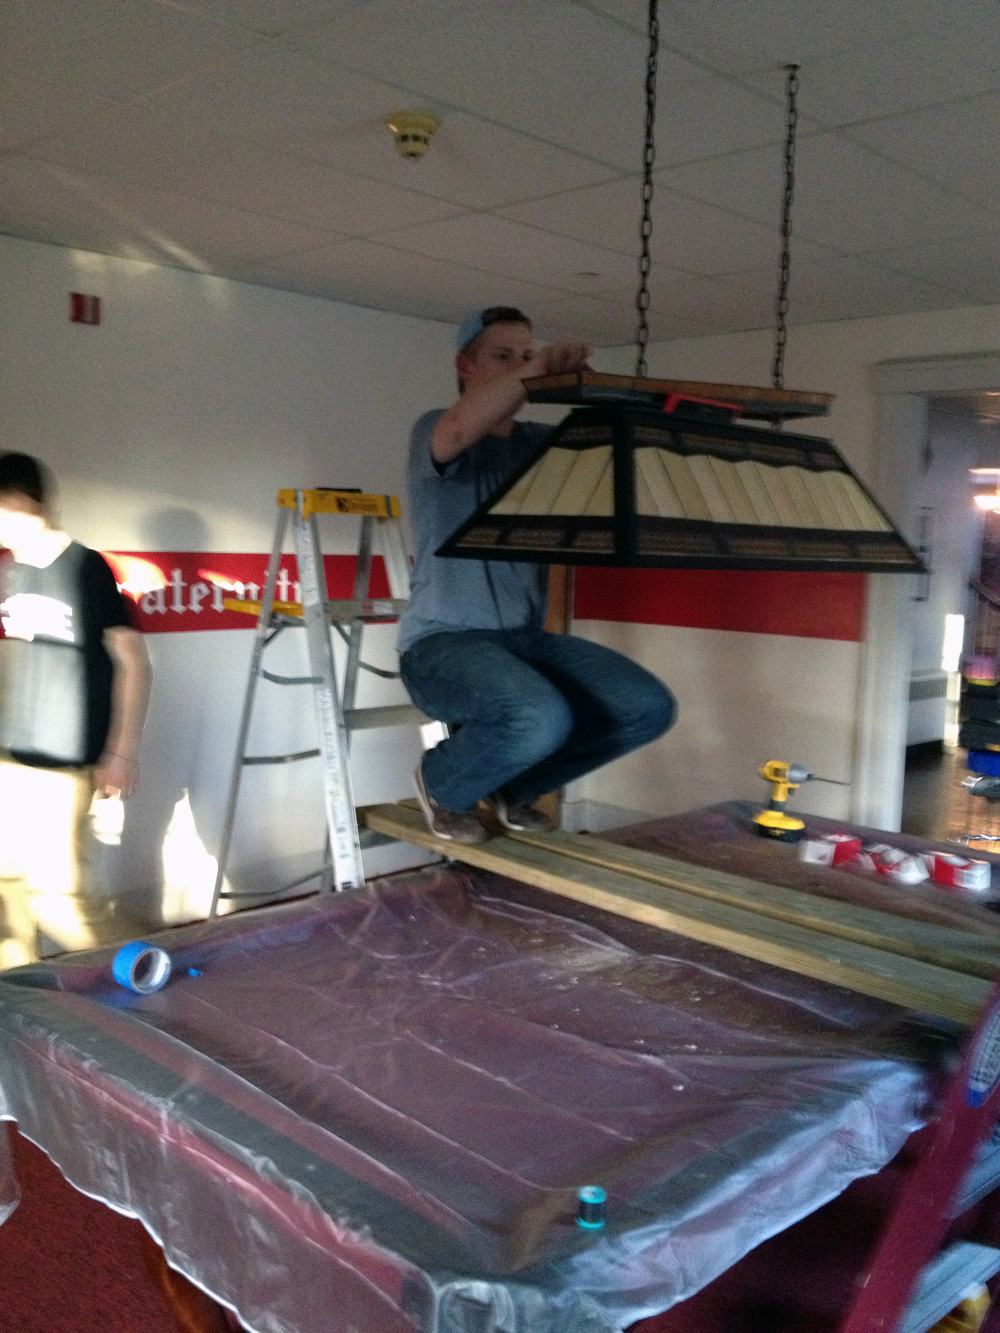 2013 Alumni Work Weekend - Pool Room Project Kevin Trippel installs the new pool light